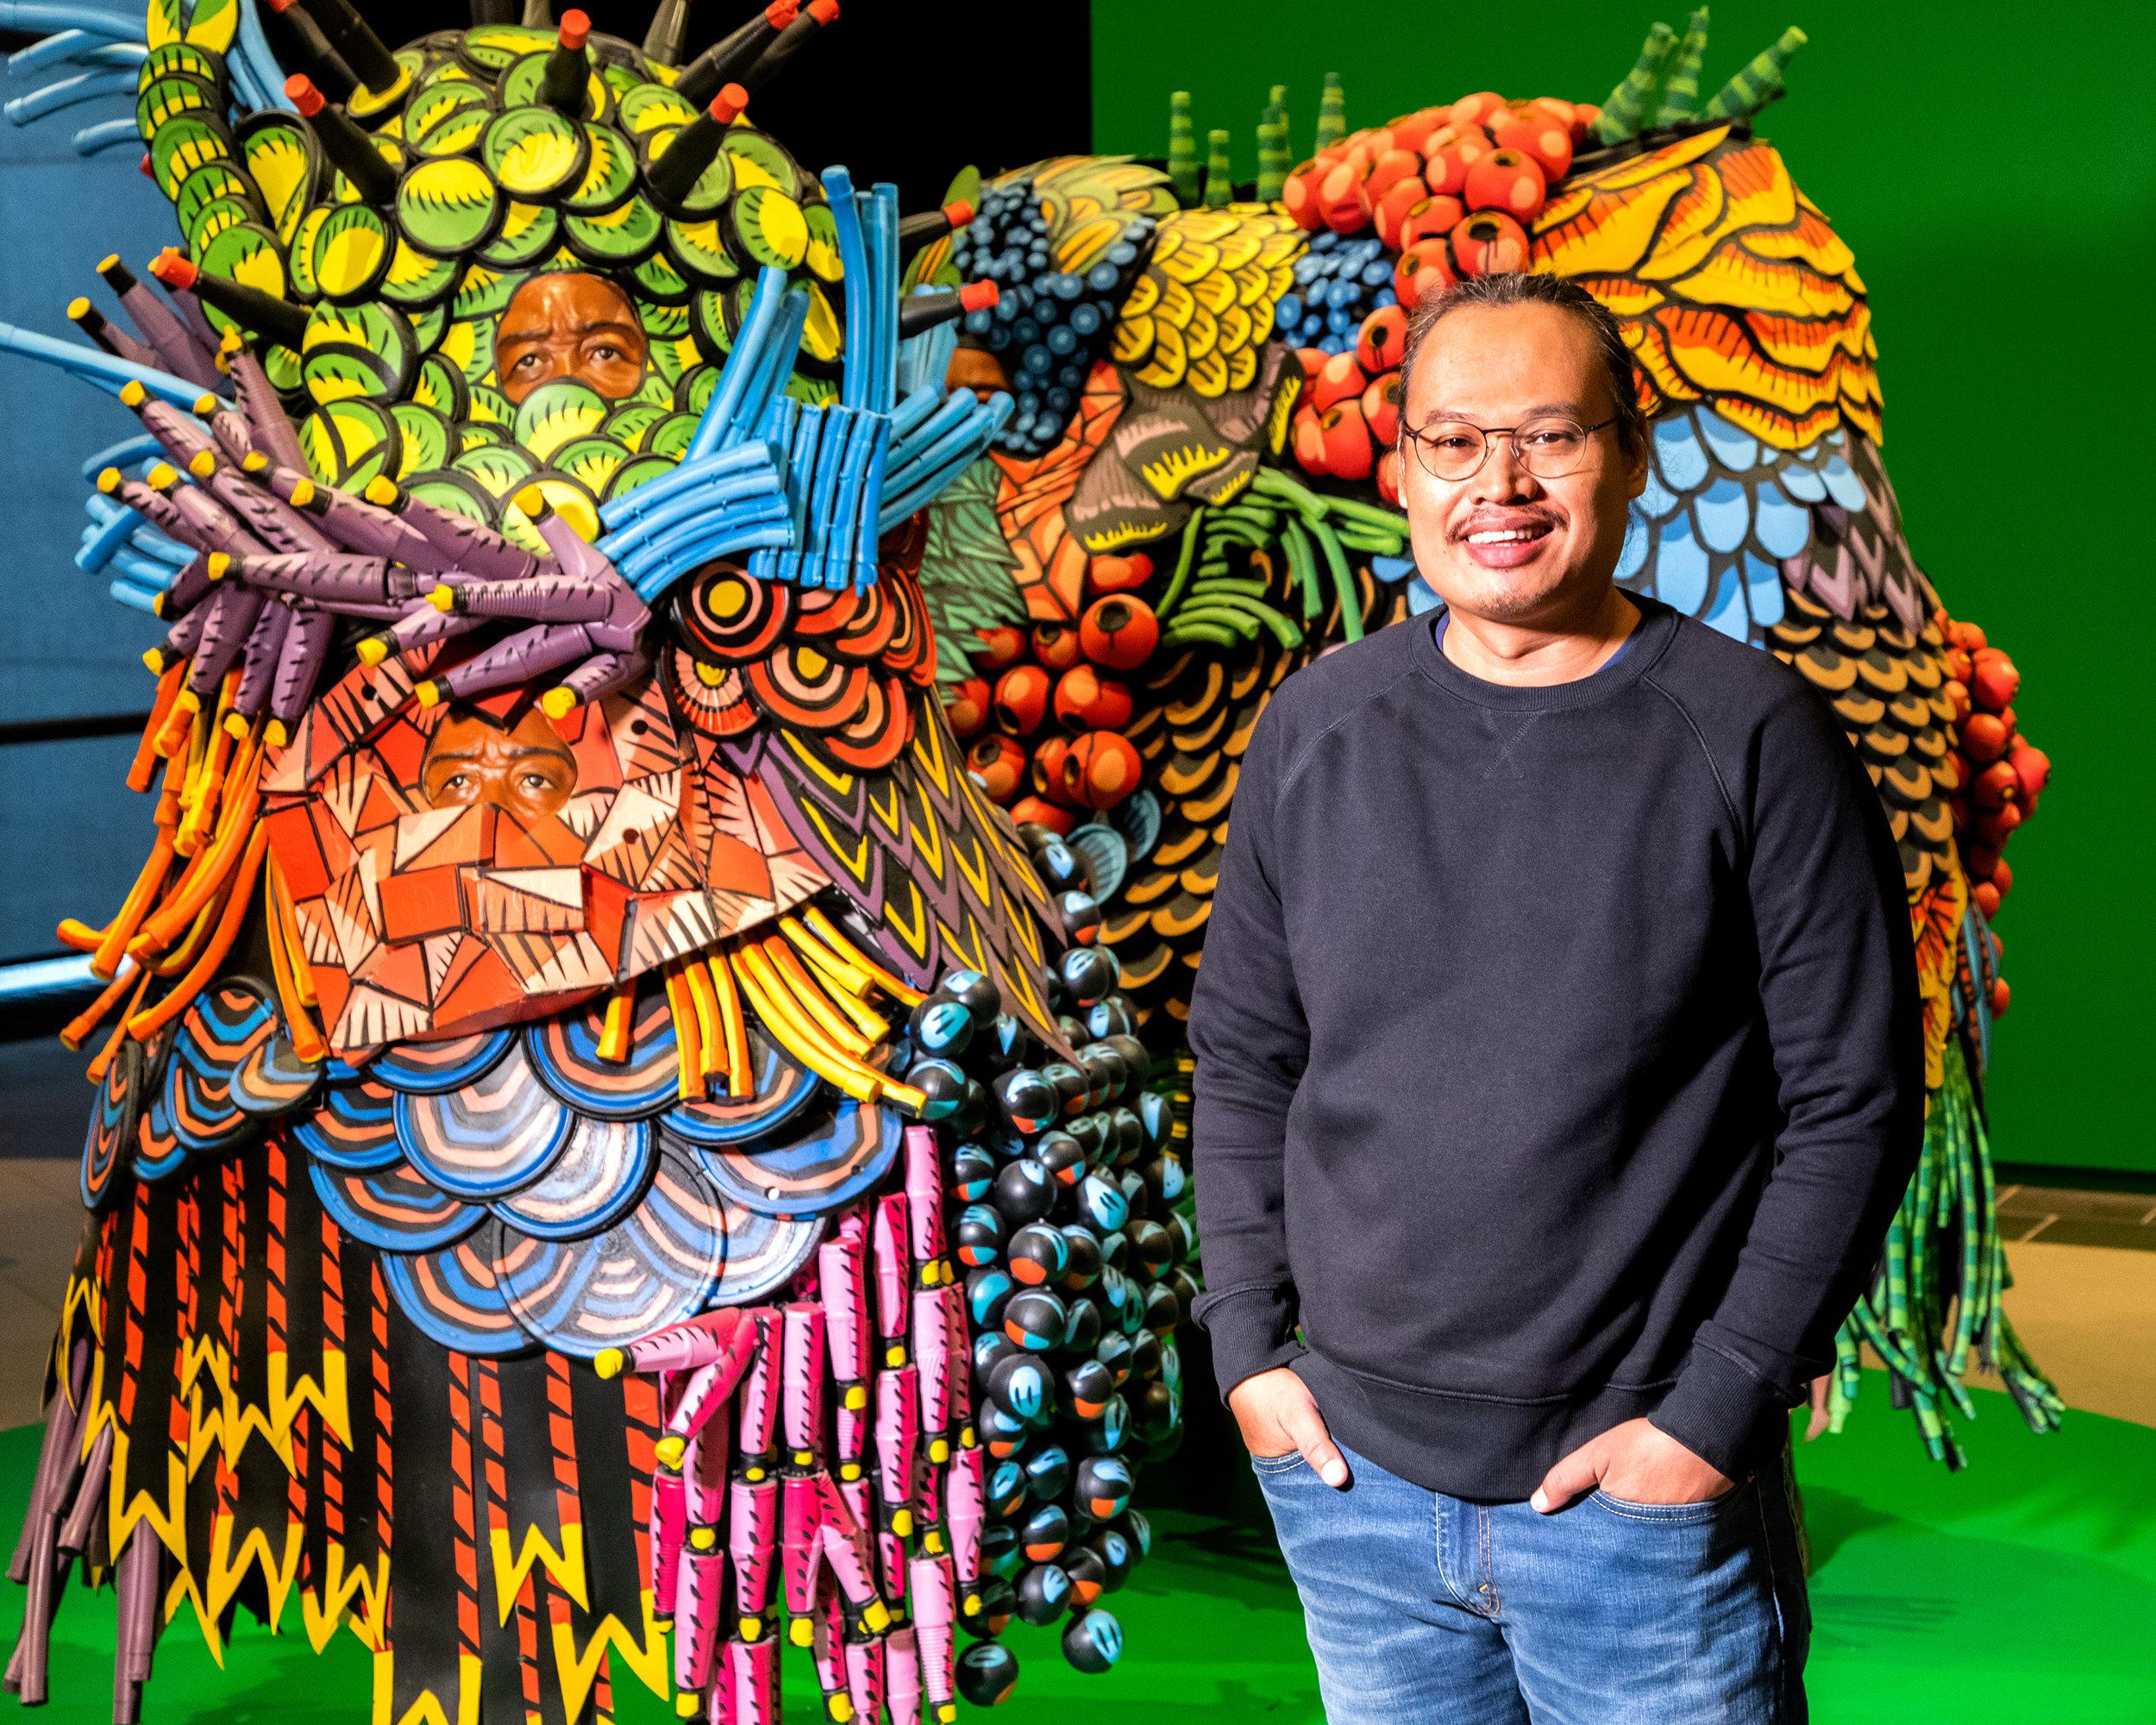 Artist  Eko Nugroho  with  Carnival trap   2  (2018)